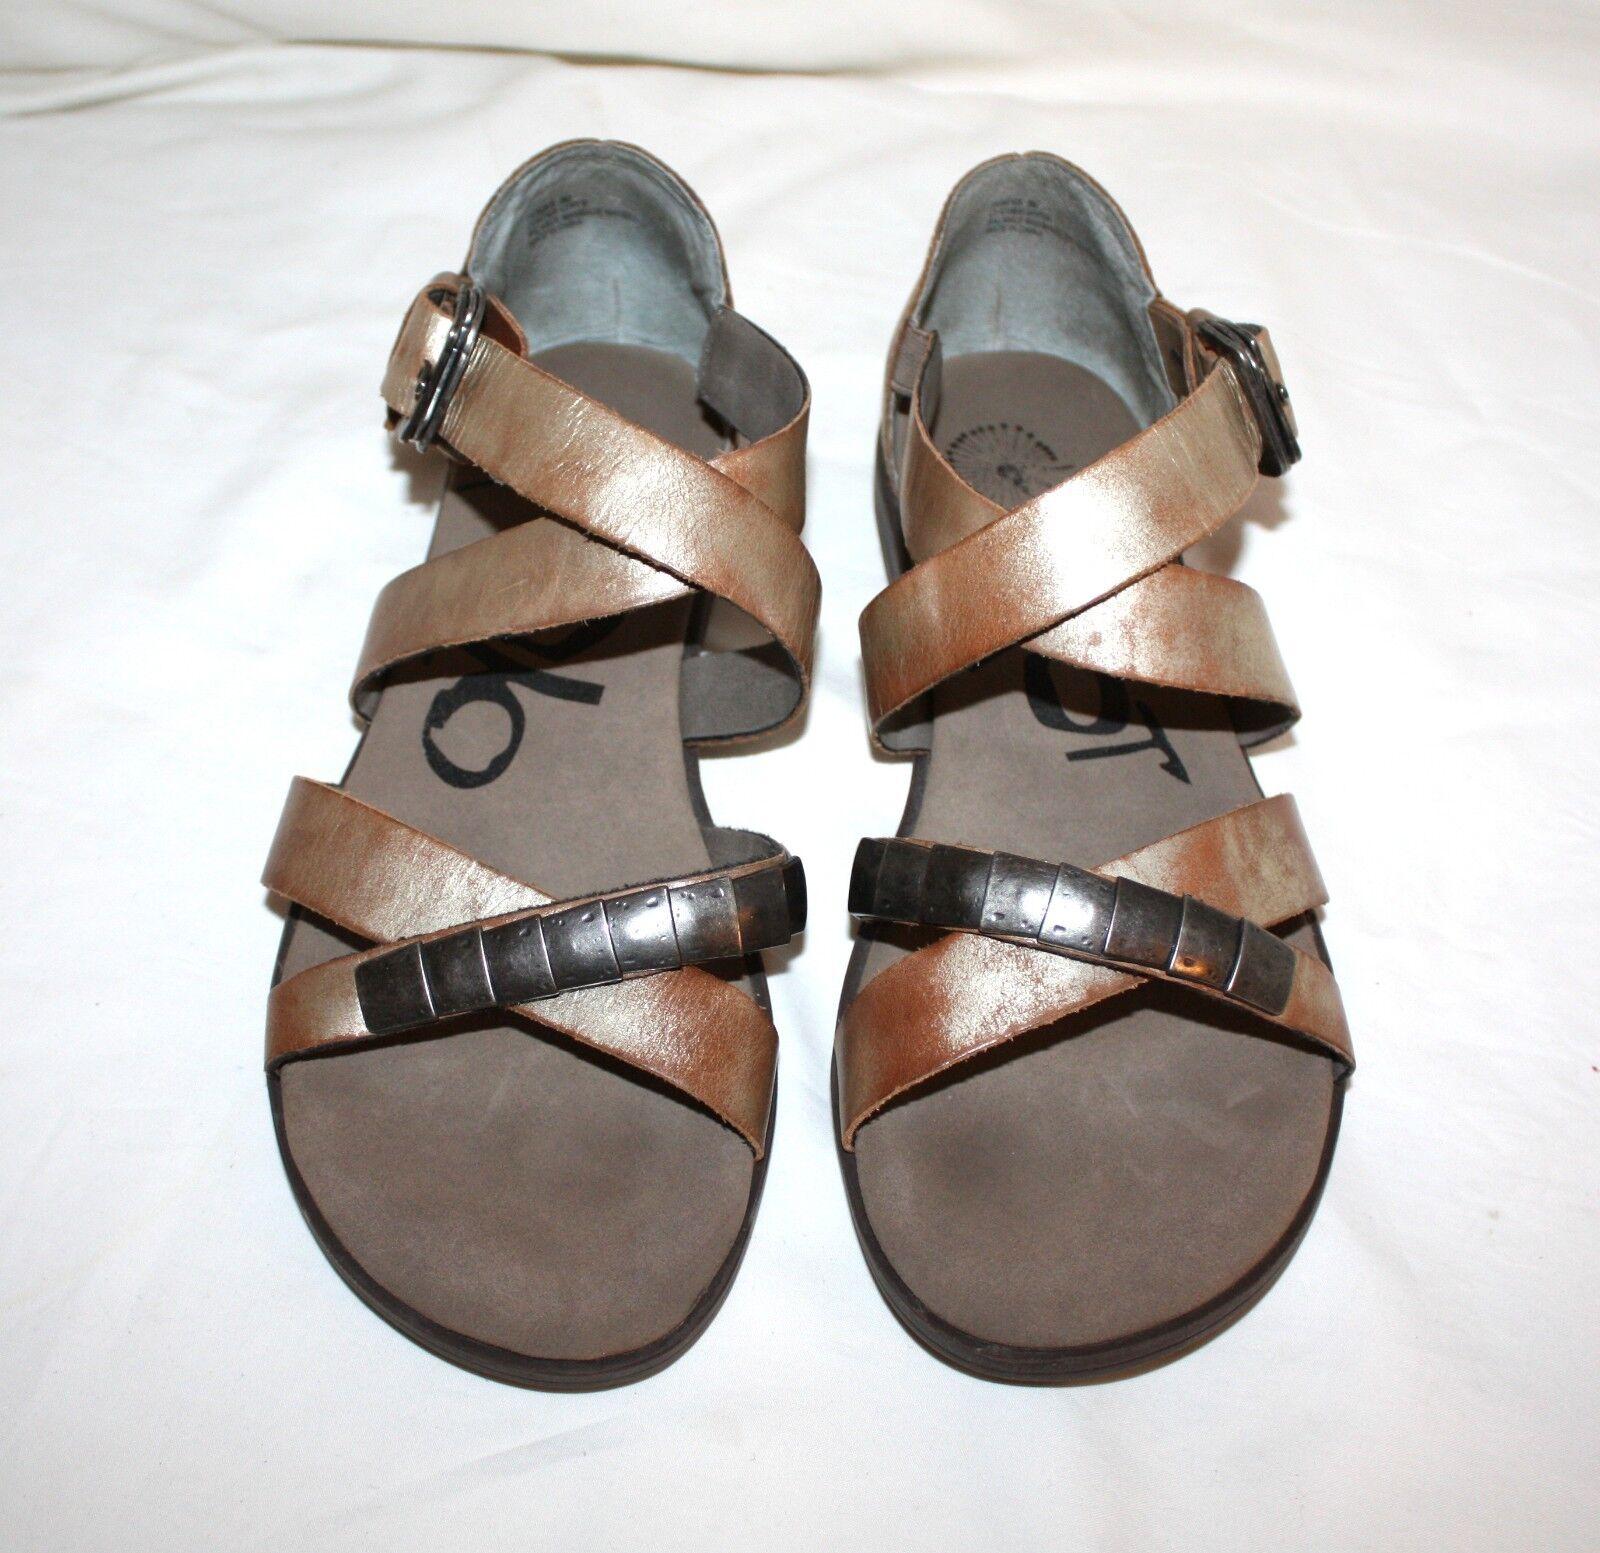 OTBT Pender Distressed Leather Sandals Size 8 M